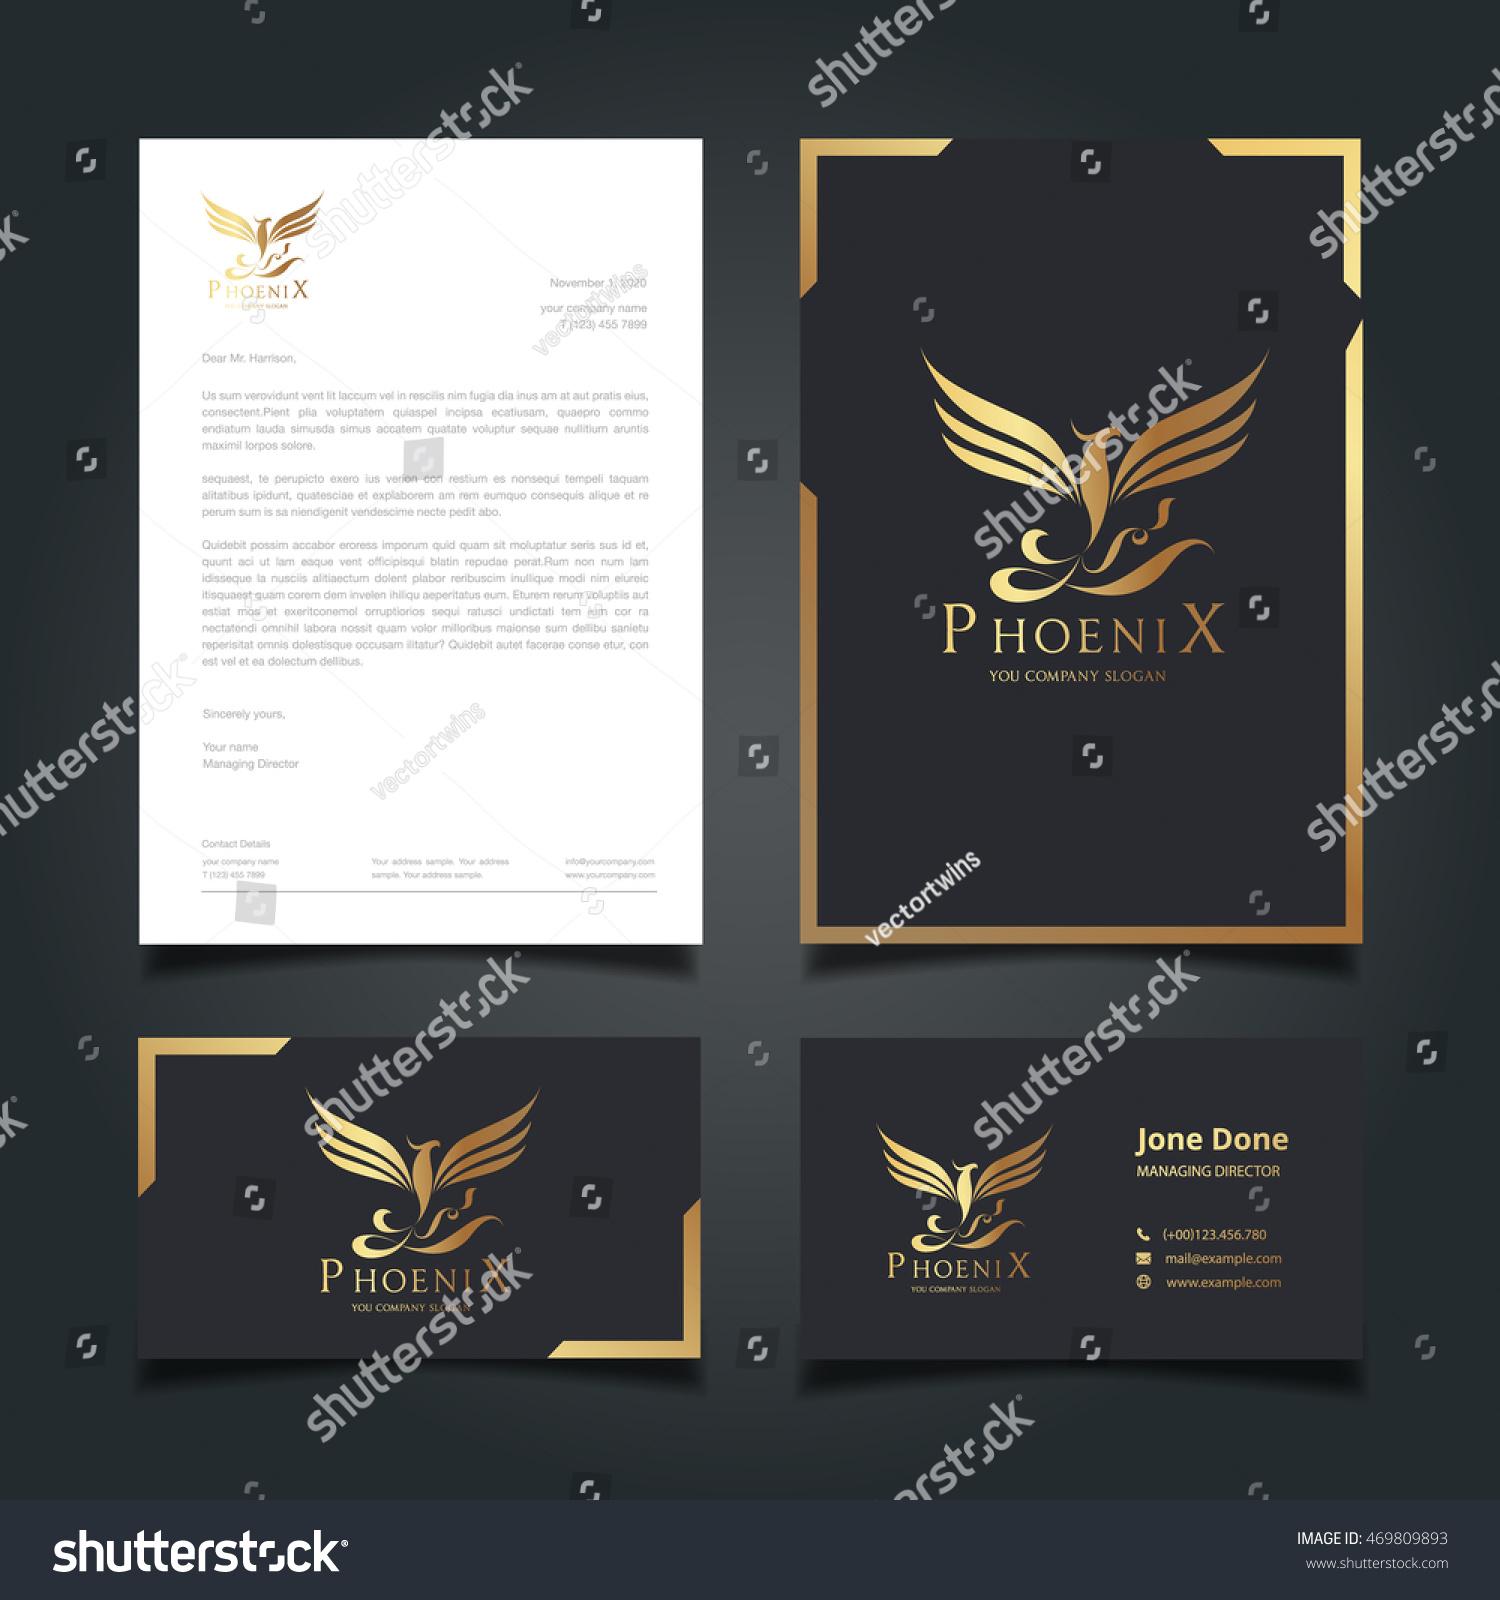 Stationery Template Phoenix Logo Business Cards Stock Photo (Photo ...